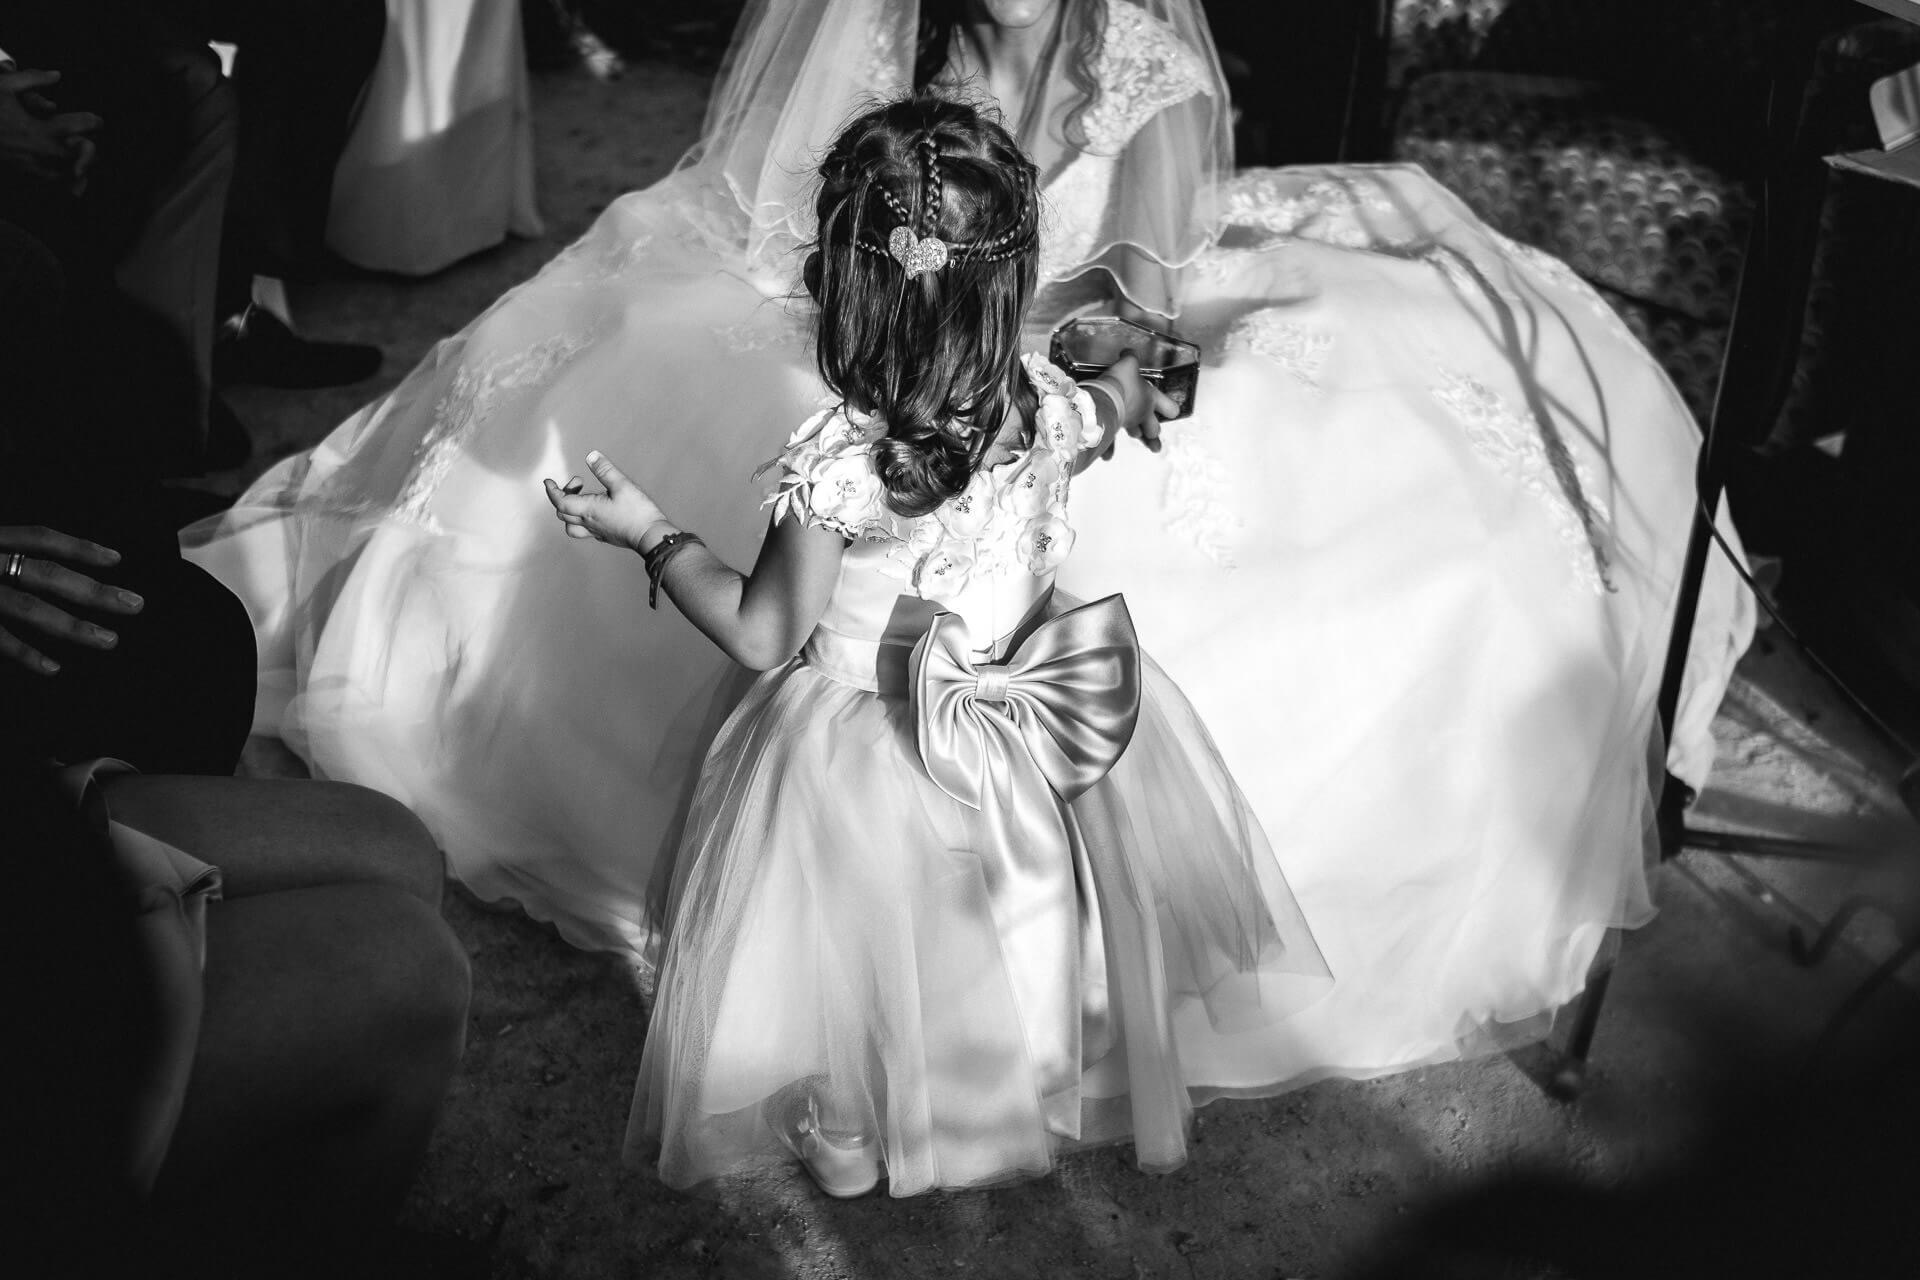 rituel laique photographe amriage montarnaud mas dieu